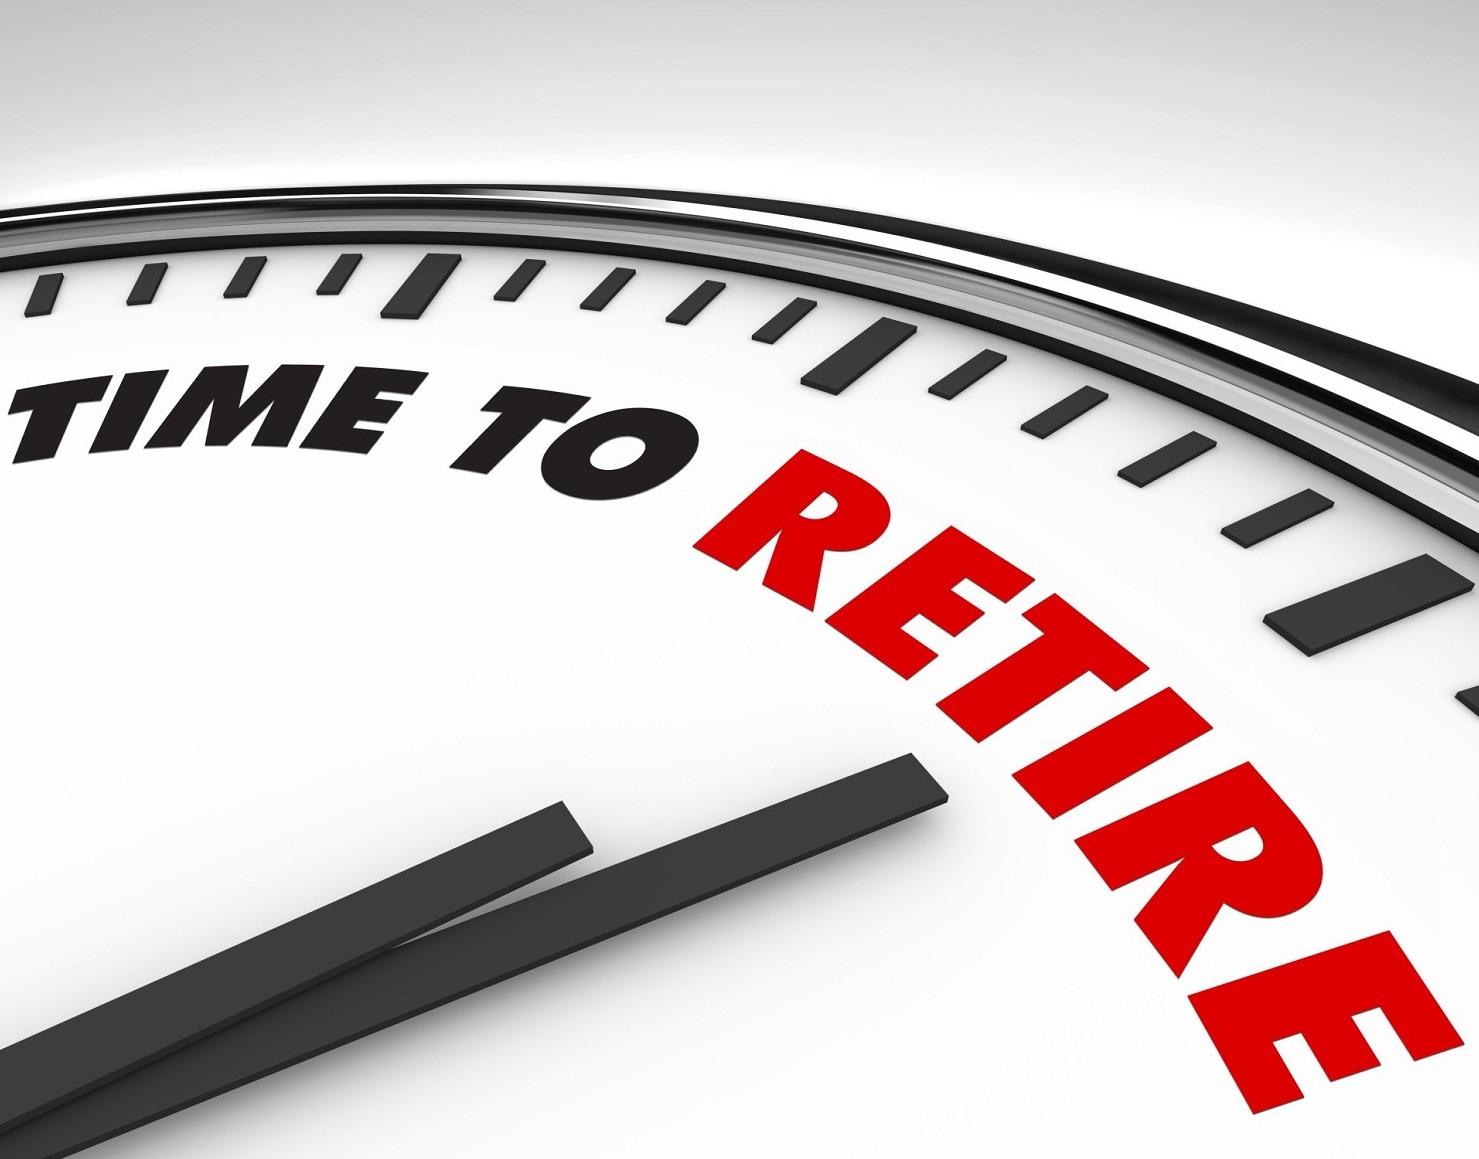 Pensioni ultime notizie attese novit� ne